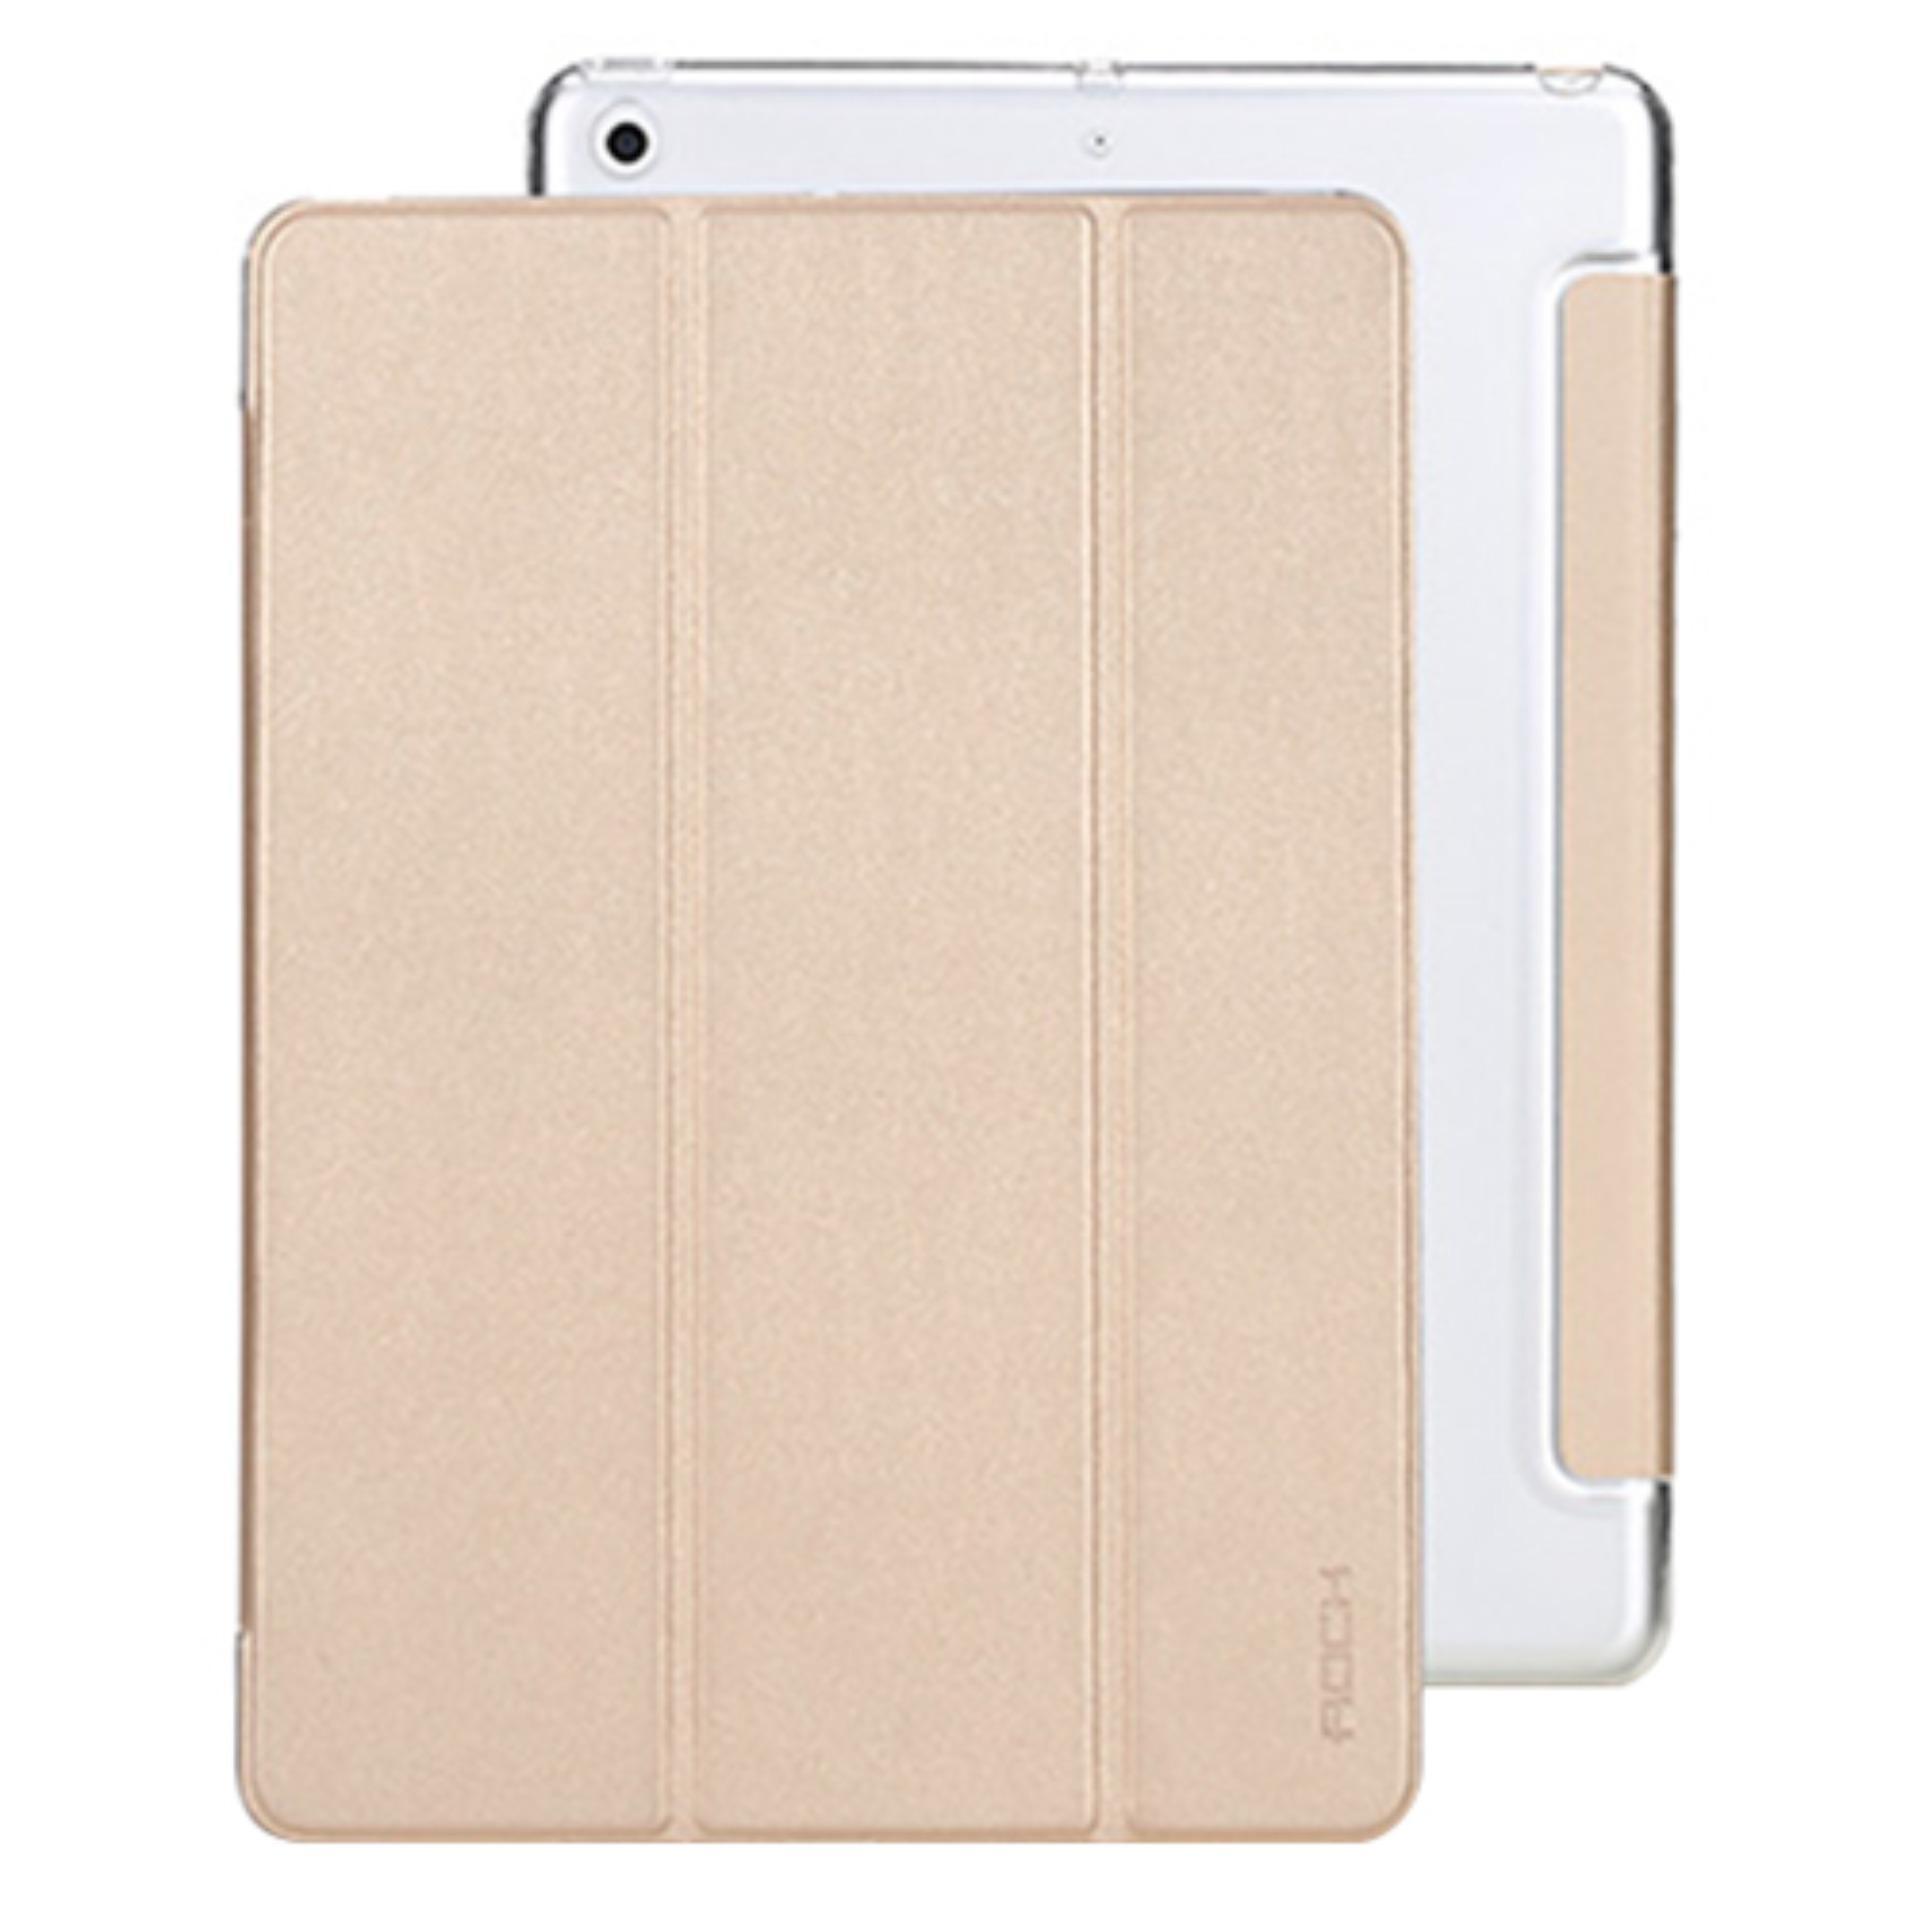 Bao da iPad Pro New 2017 10.5 Rock Touch Series Protection Case